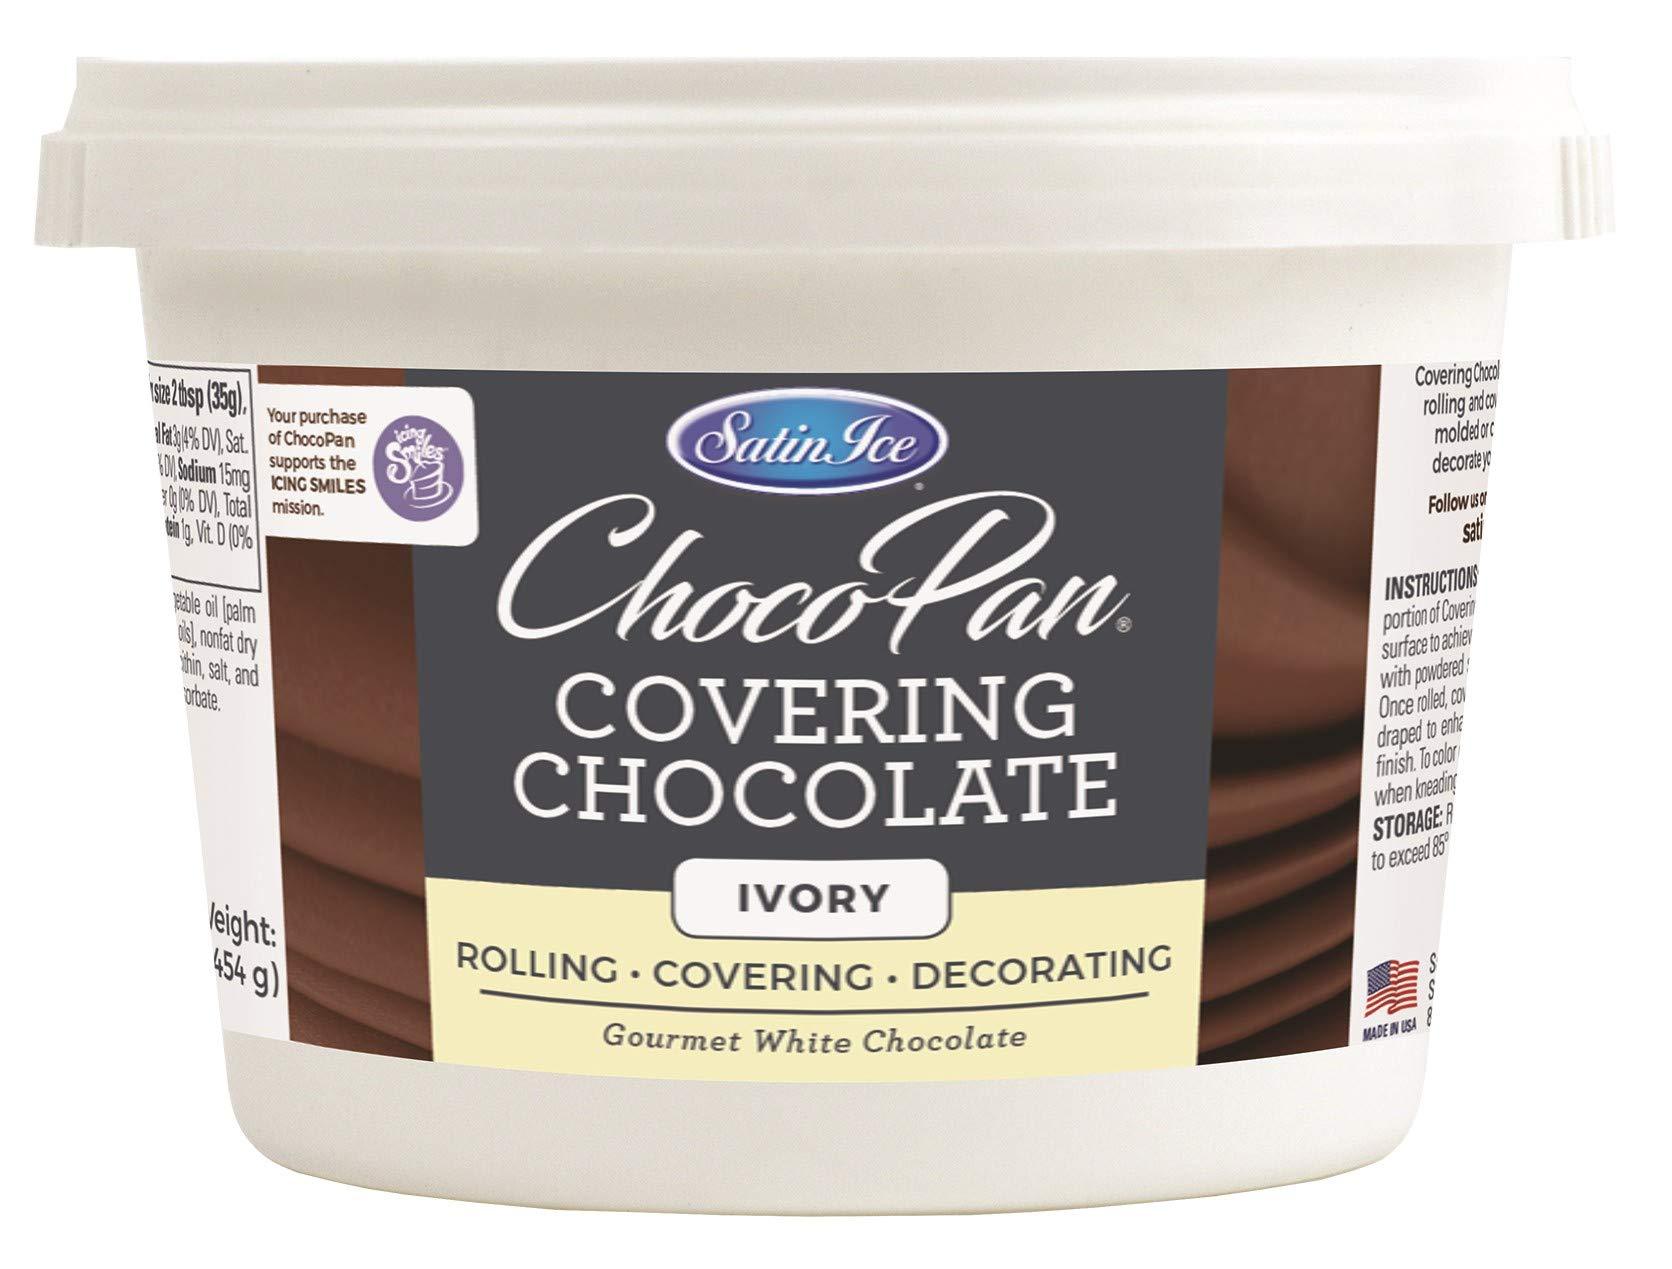 Satin Ice ChocoPan Ivory Covering Chocolate, 1 Pound